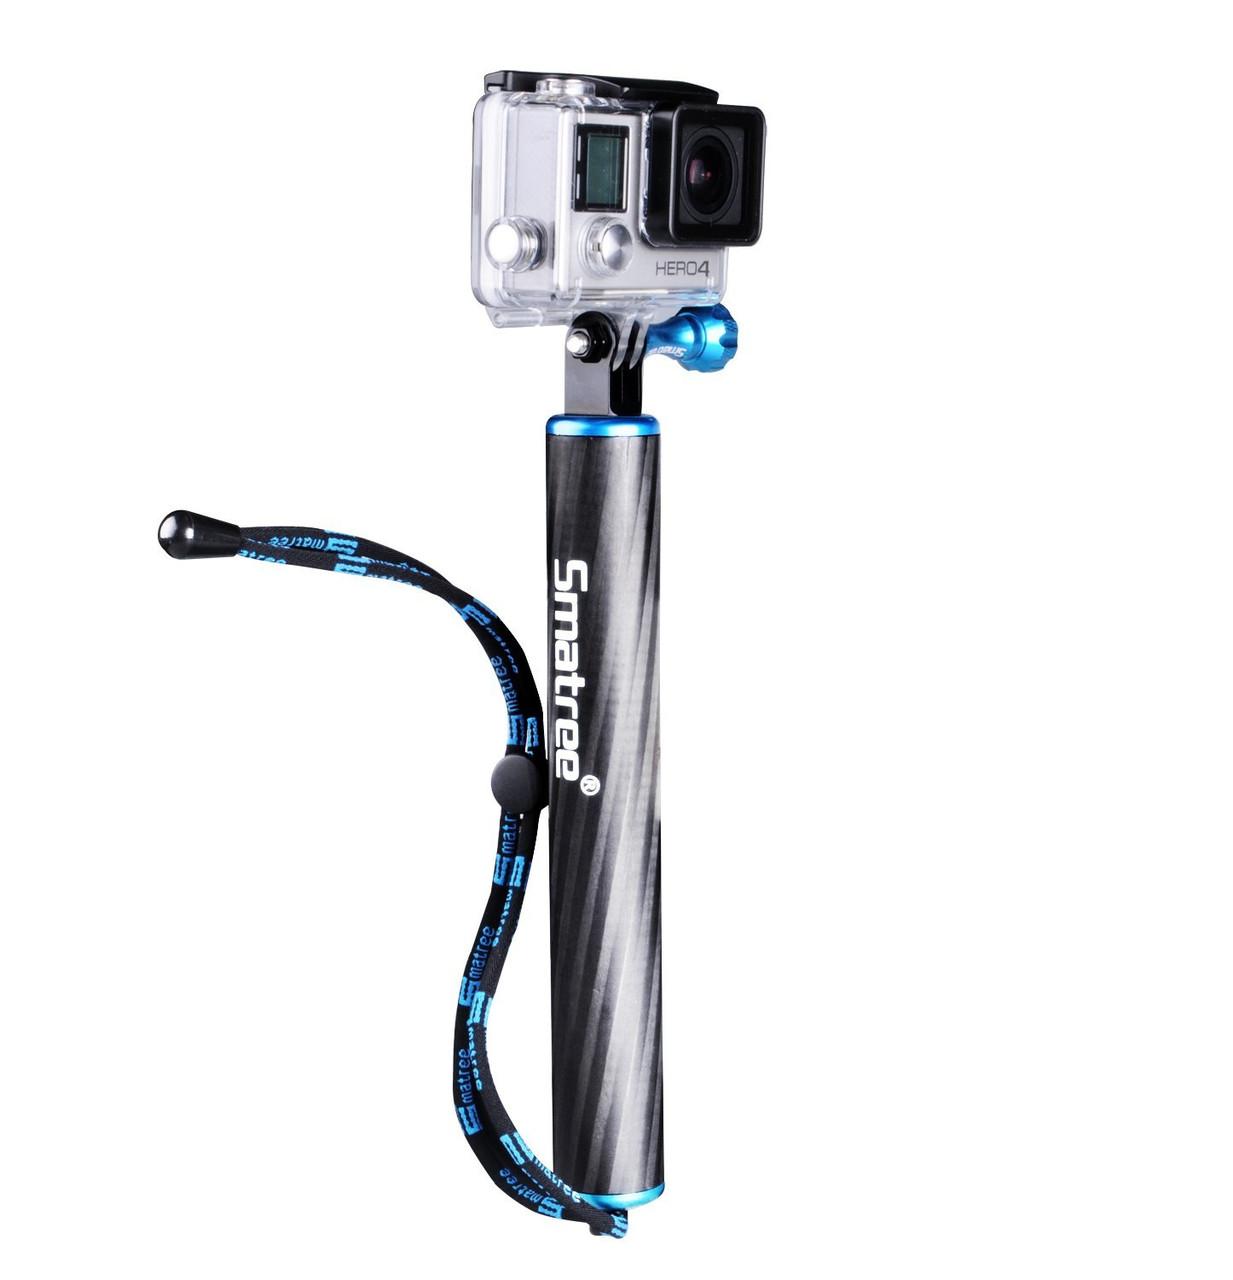 Поплавок-ручка Smatree® SmaPole F1 для GoPro 5/4/3+/3/SJCAM/Xiaomi